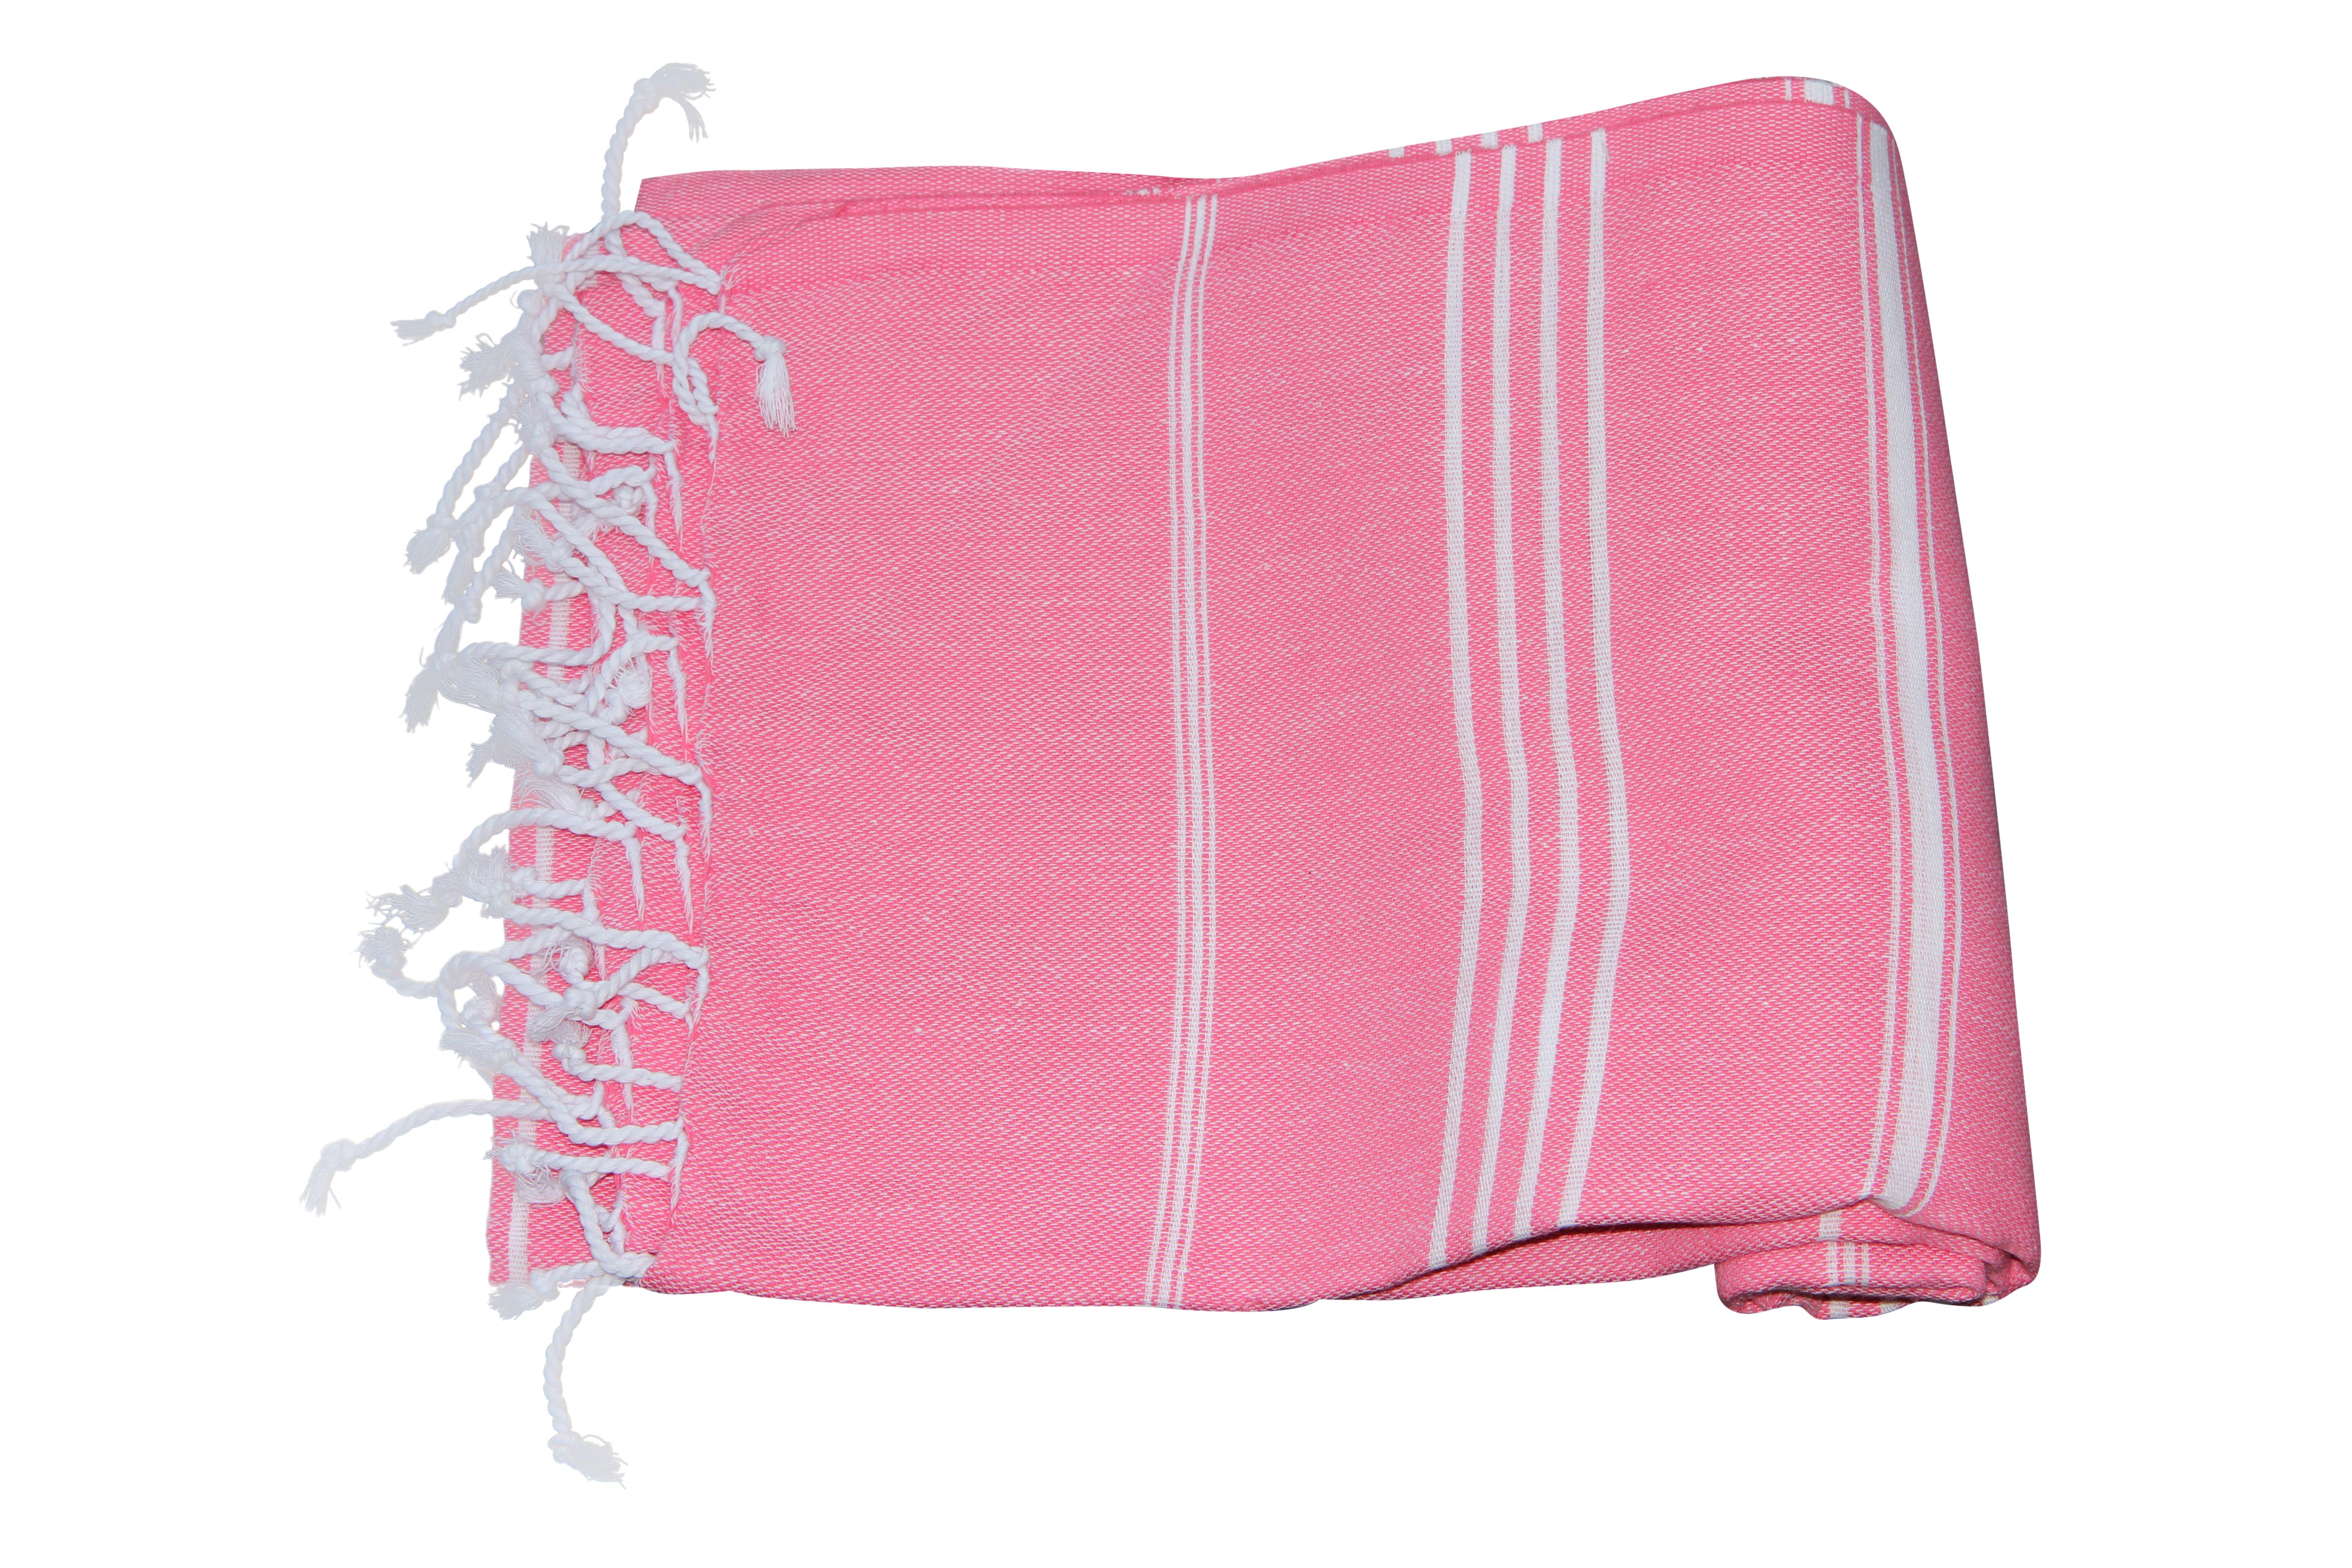 Hamamdoek roze 100 katoen (180cm x 100cm)